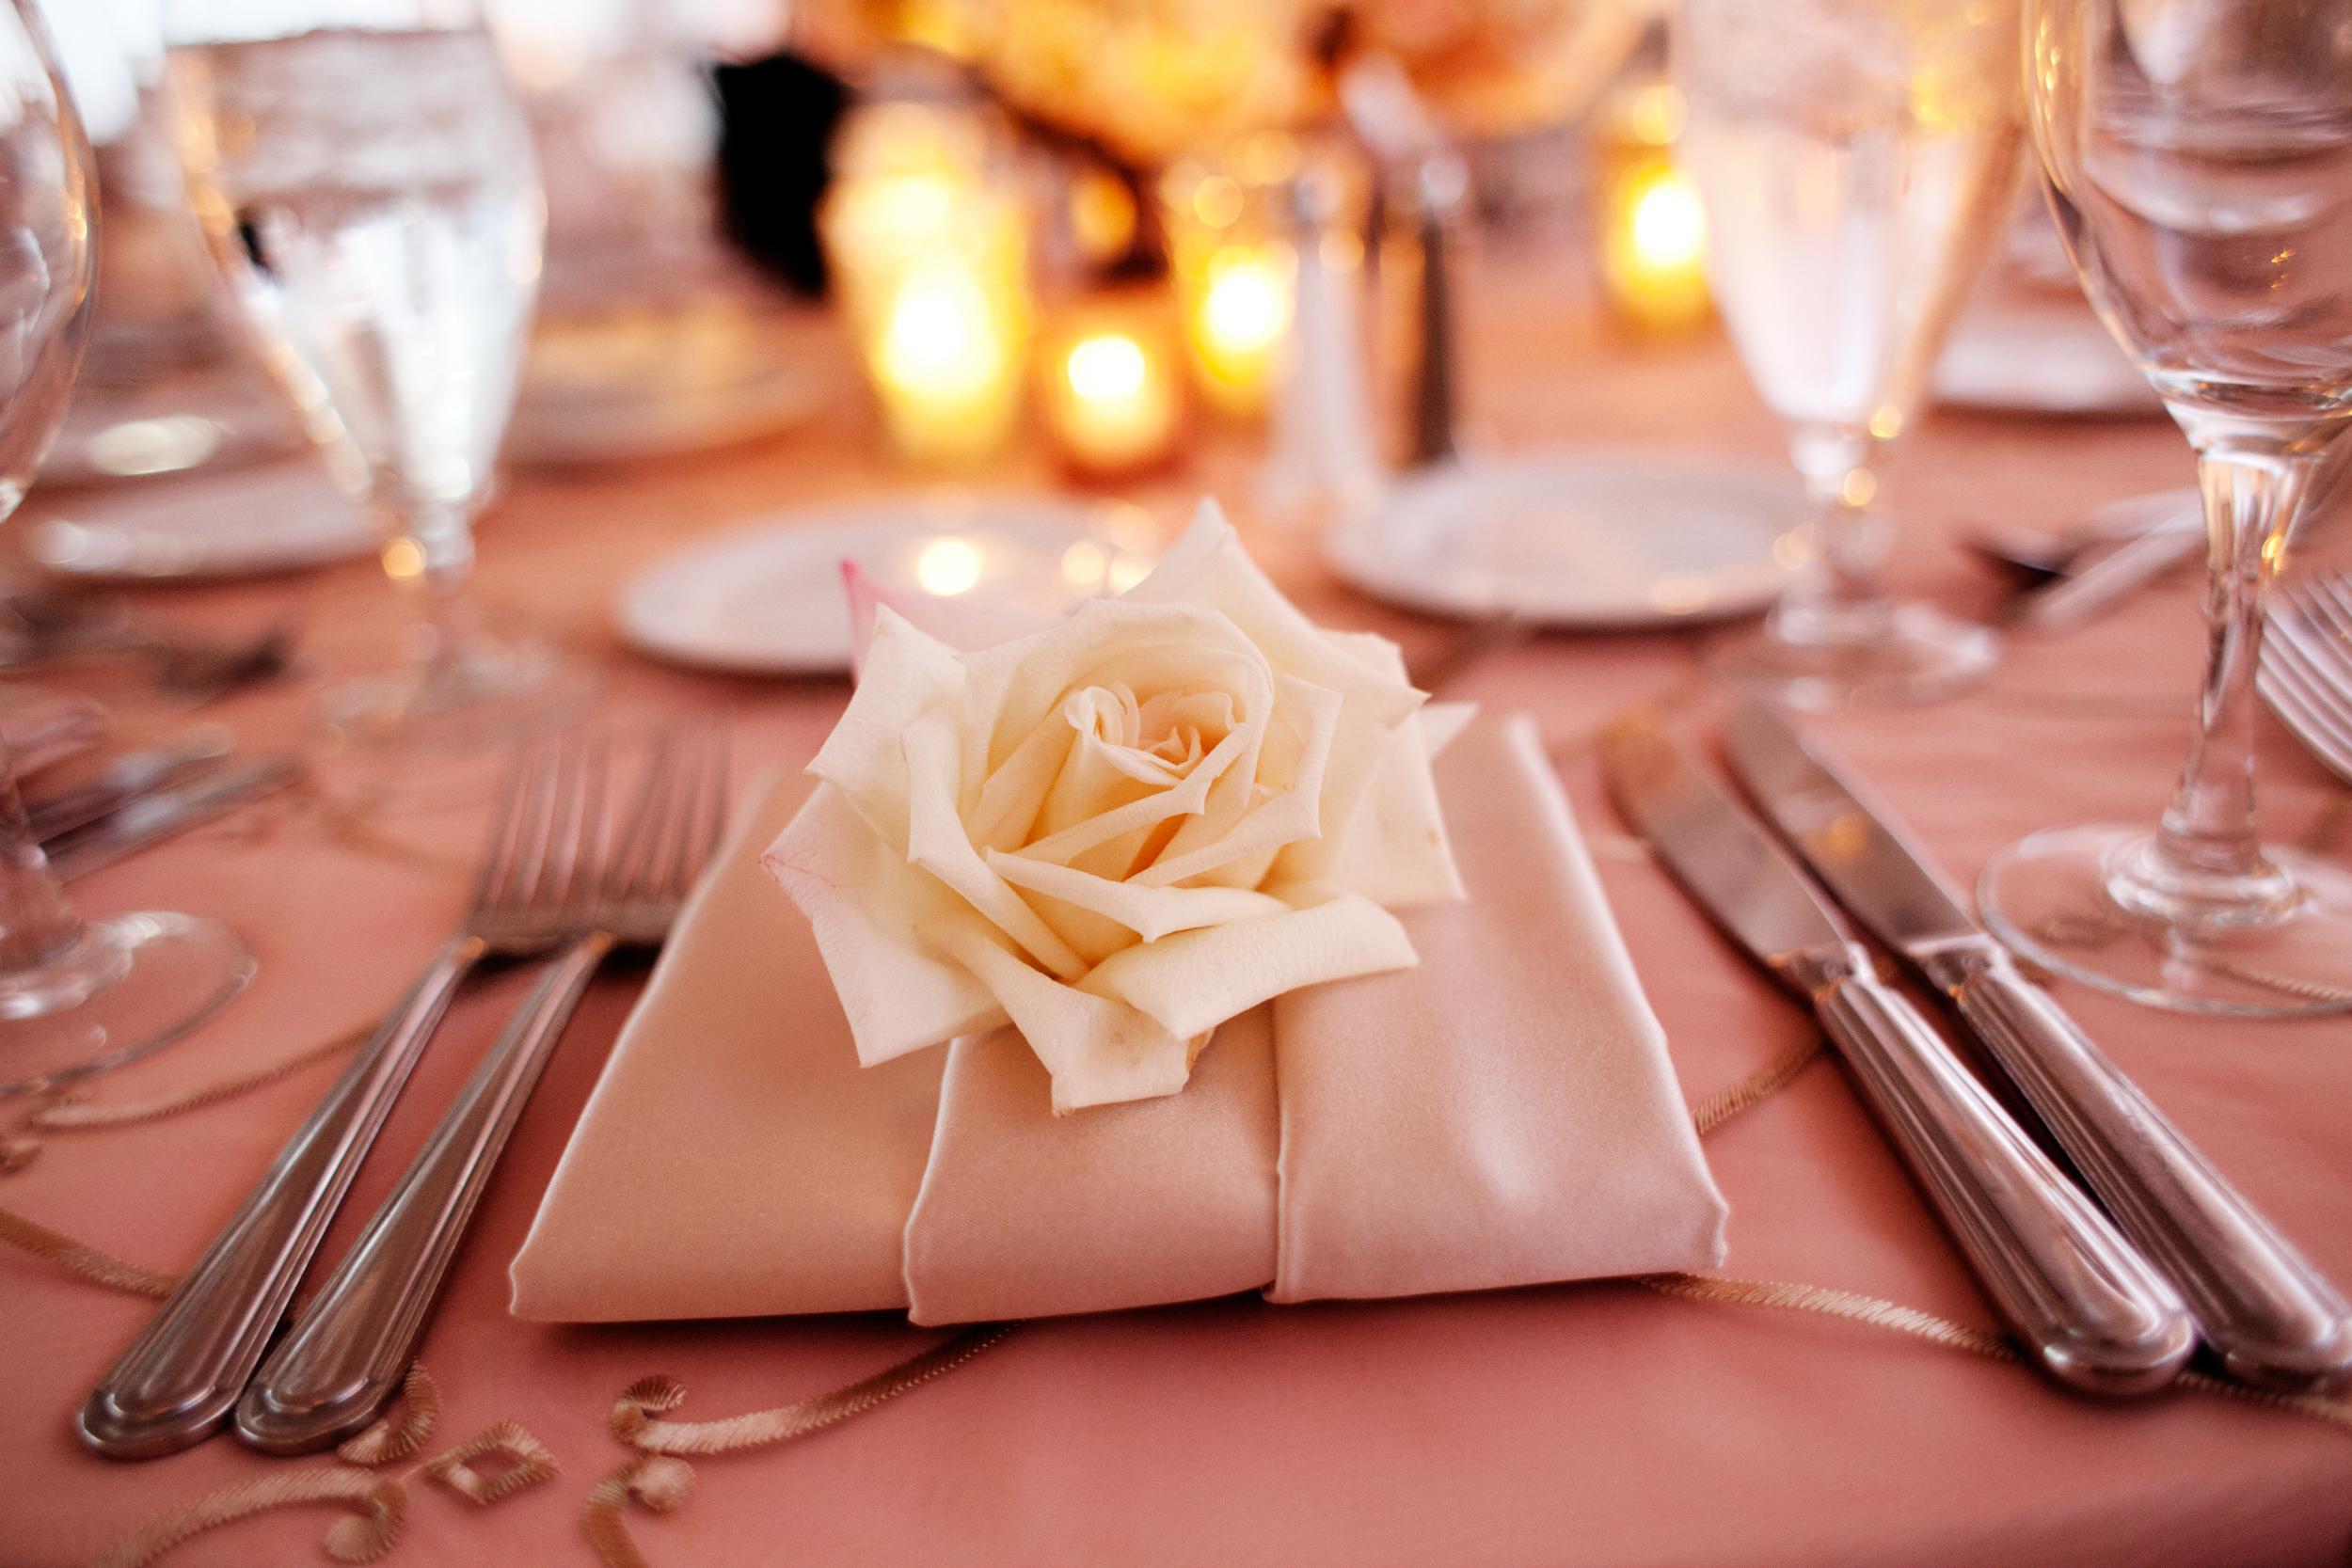 Ceci_New_York_Ceci_Style_Ceci_Johnson_Luxury_Lifestyle_Floral_Lace_Wedding_Letterpress_Inspiration_Design_Custom_Couture_Personalized_Invitations_-108.jpg